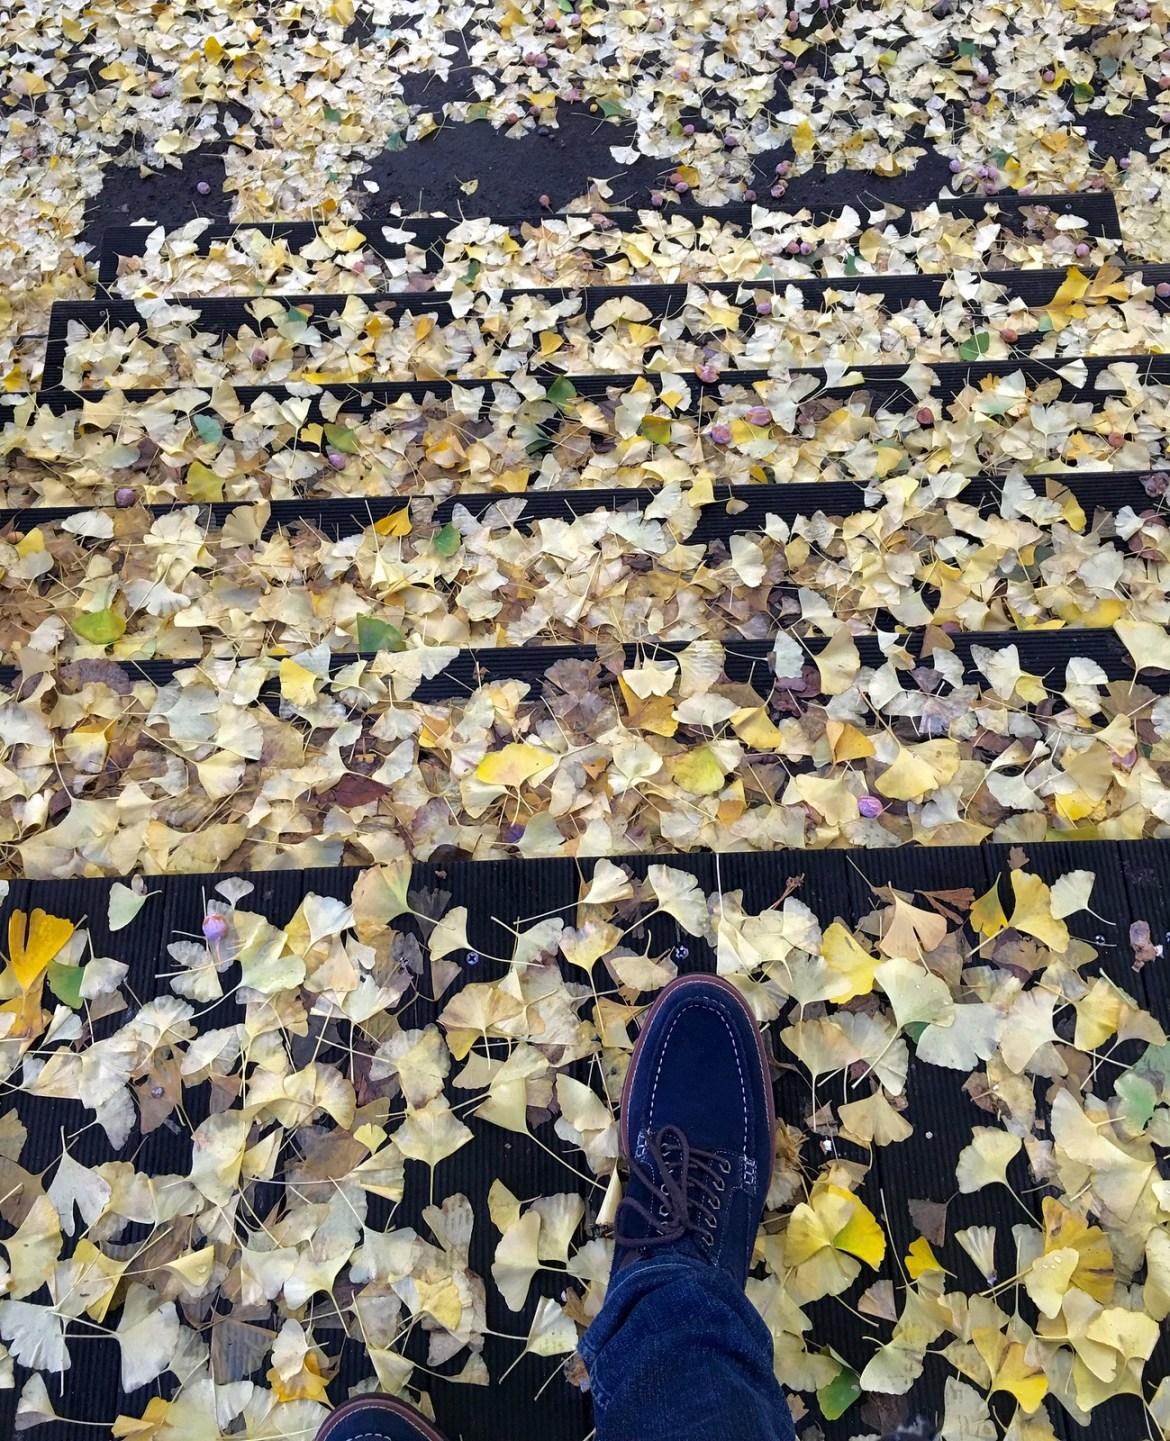 University of Tokyo Ginkgo leaves